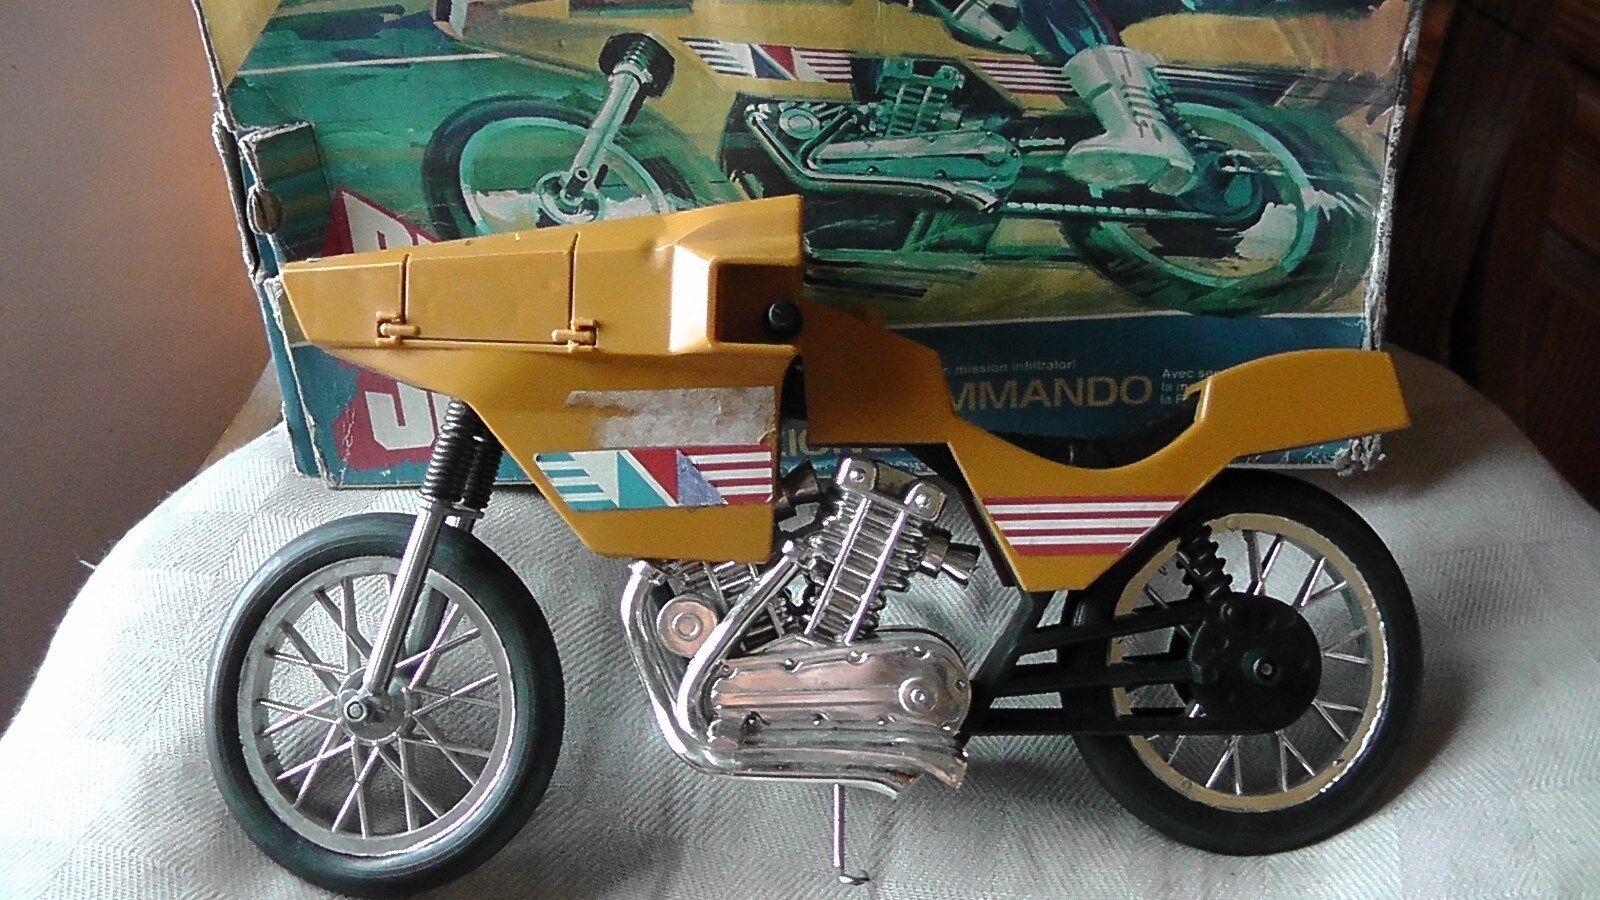 BIG JIM  COMhommeDO  MOTORCYCLE TOY MOTO SPECIAL COMhommeDO. ORIGINAL BOX 1  remise